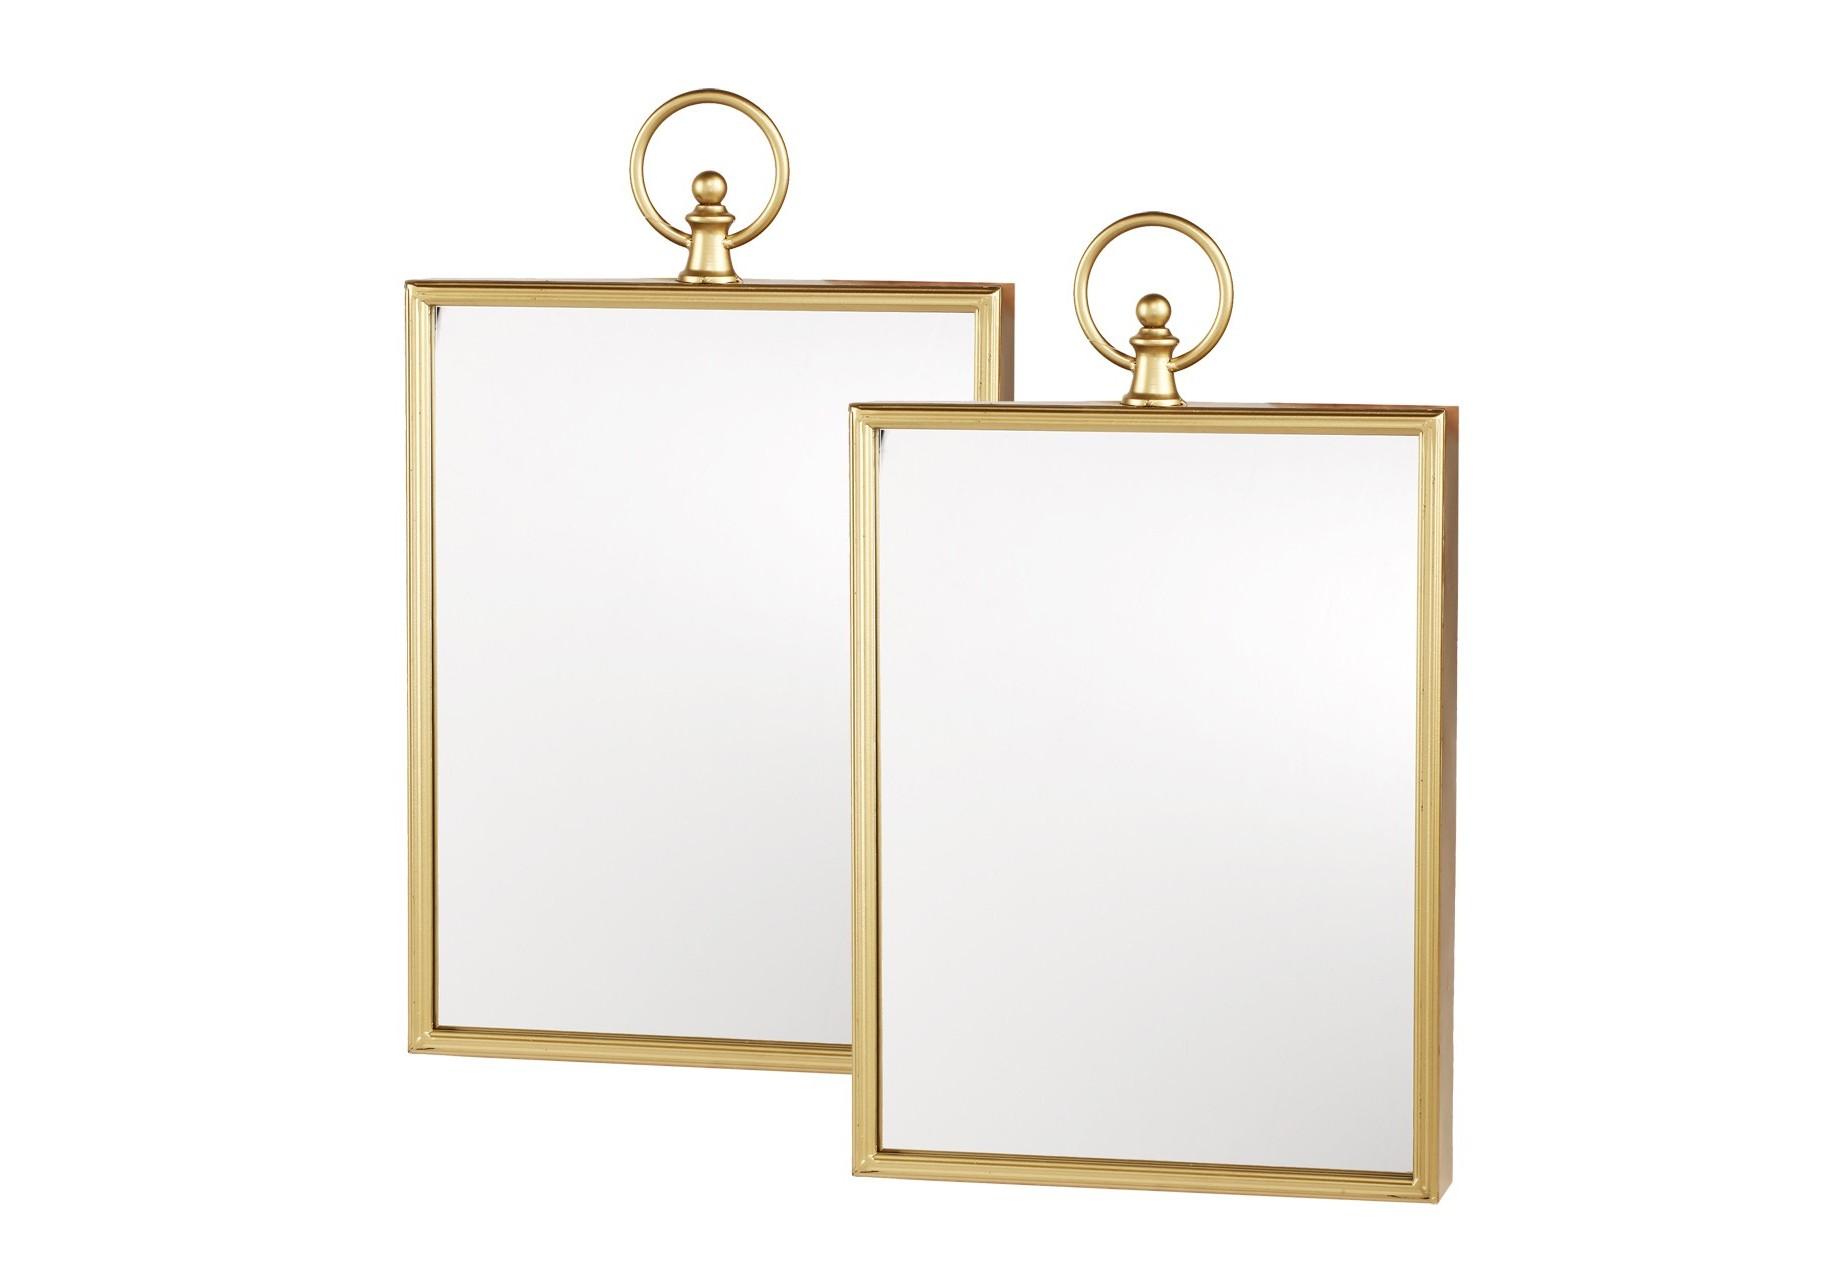 Зеркало (2шт)Настенные зеркала<br><br><br>Material: Металл<br>Width см: 33<br>Depth см: 6,5<br>Height см: 53